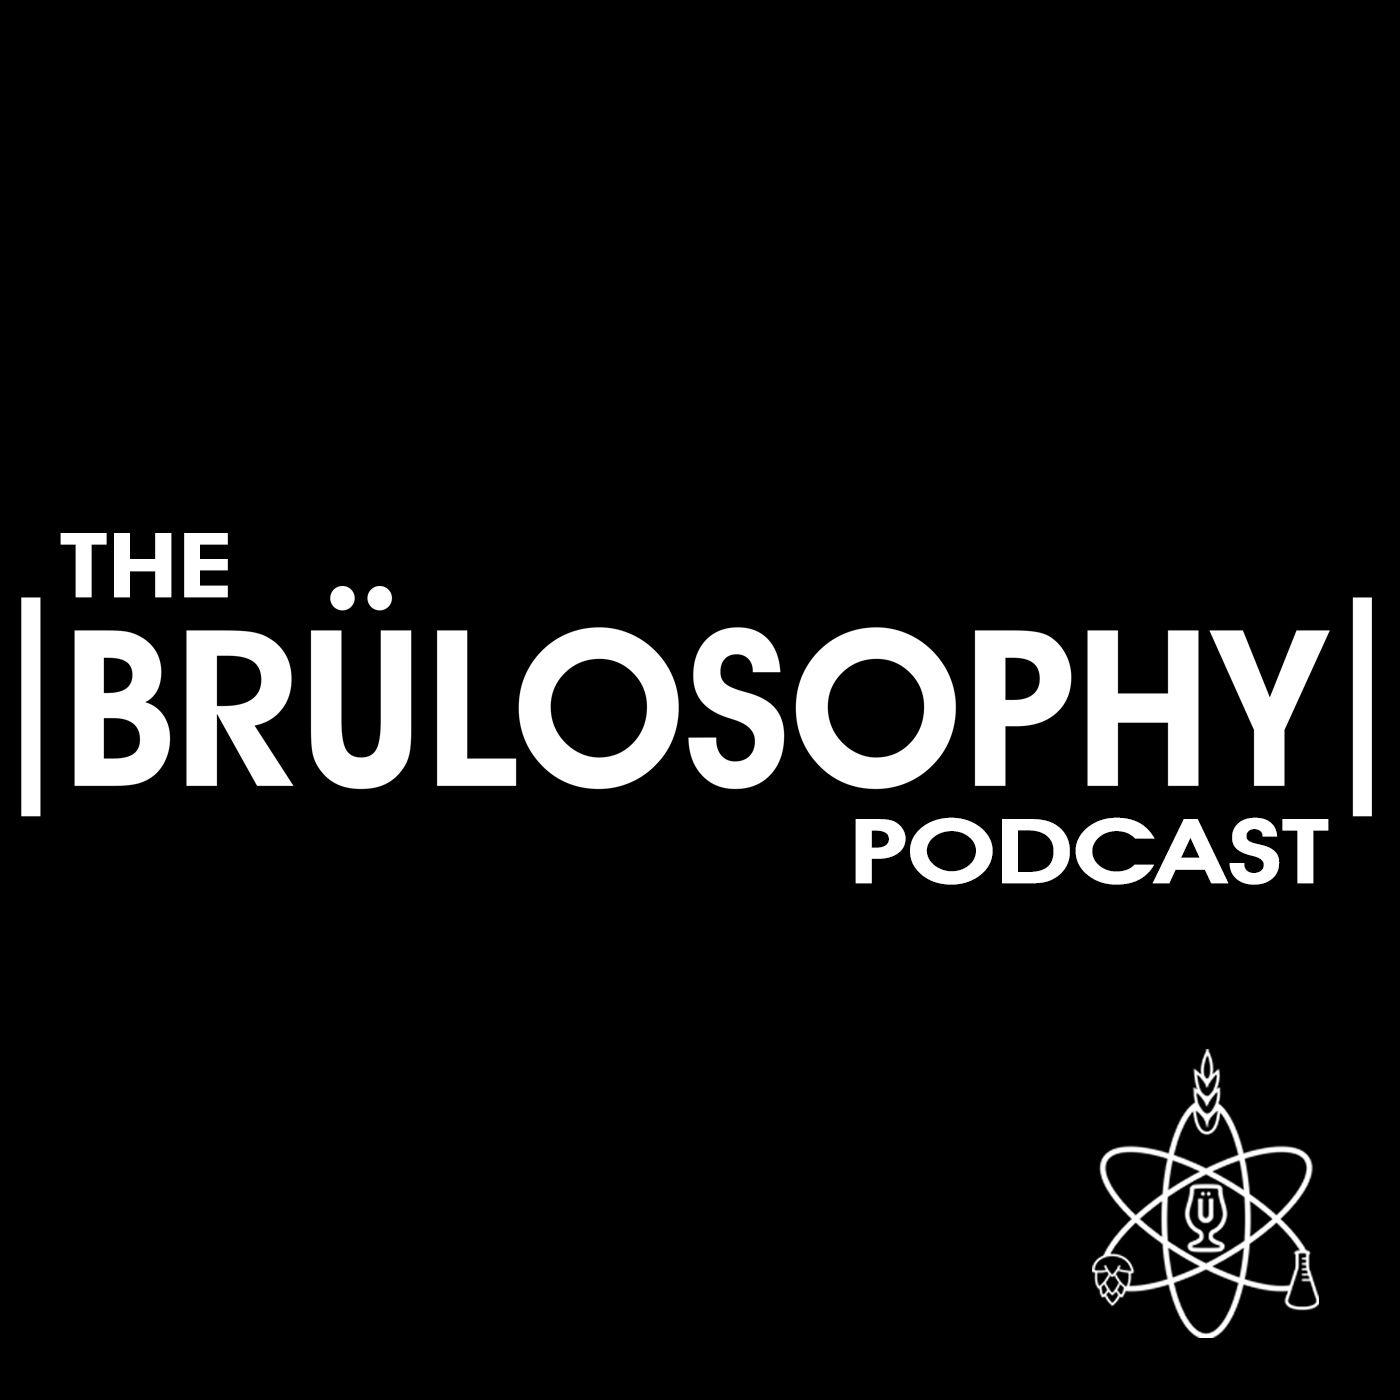 Episode 154 | exBEERience: Brewing With Barrels